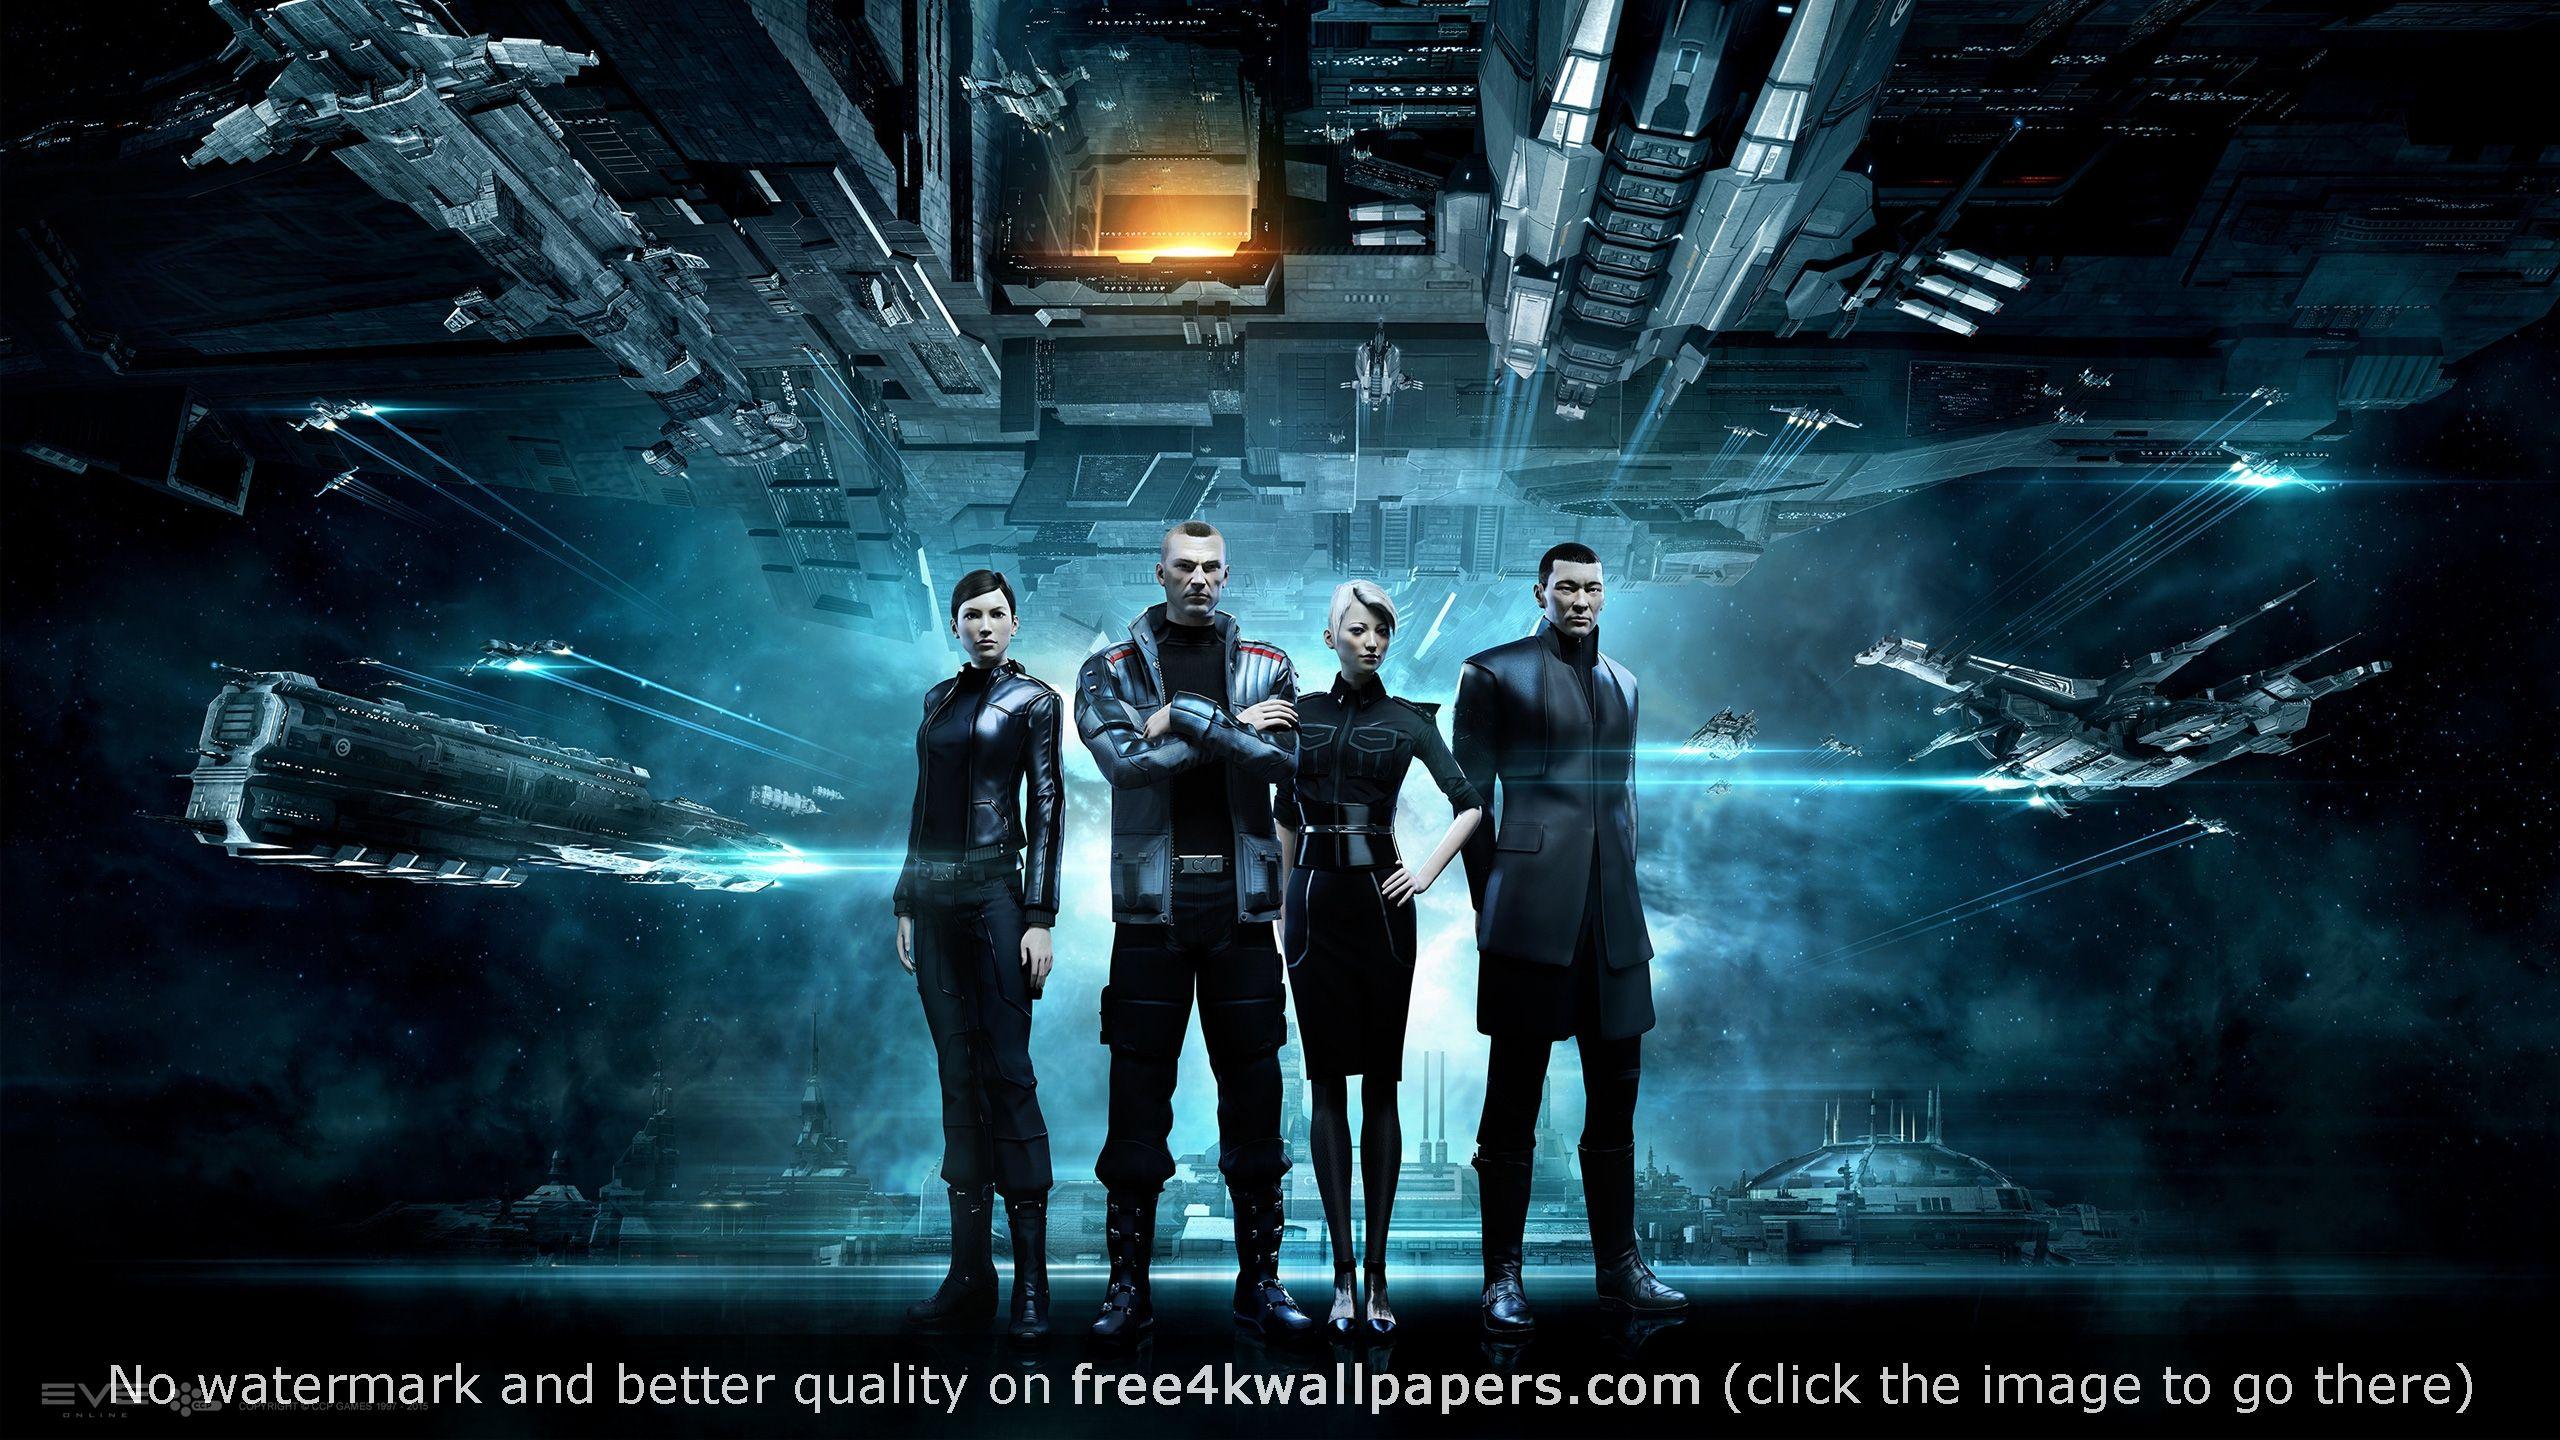 Eve Online Caldari Hd Wallpaper Eve Online Eve Valkyrie Best Sci Fi